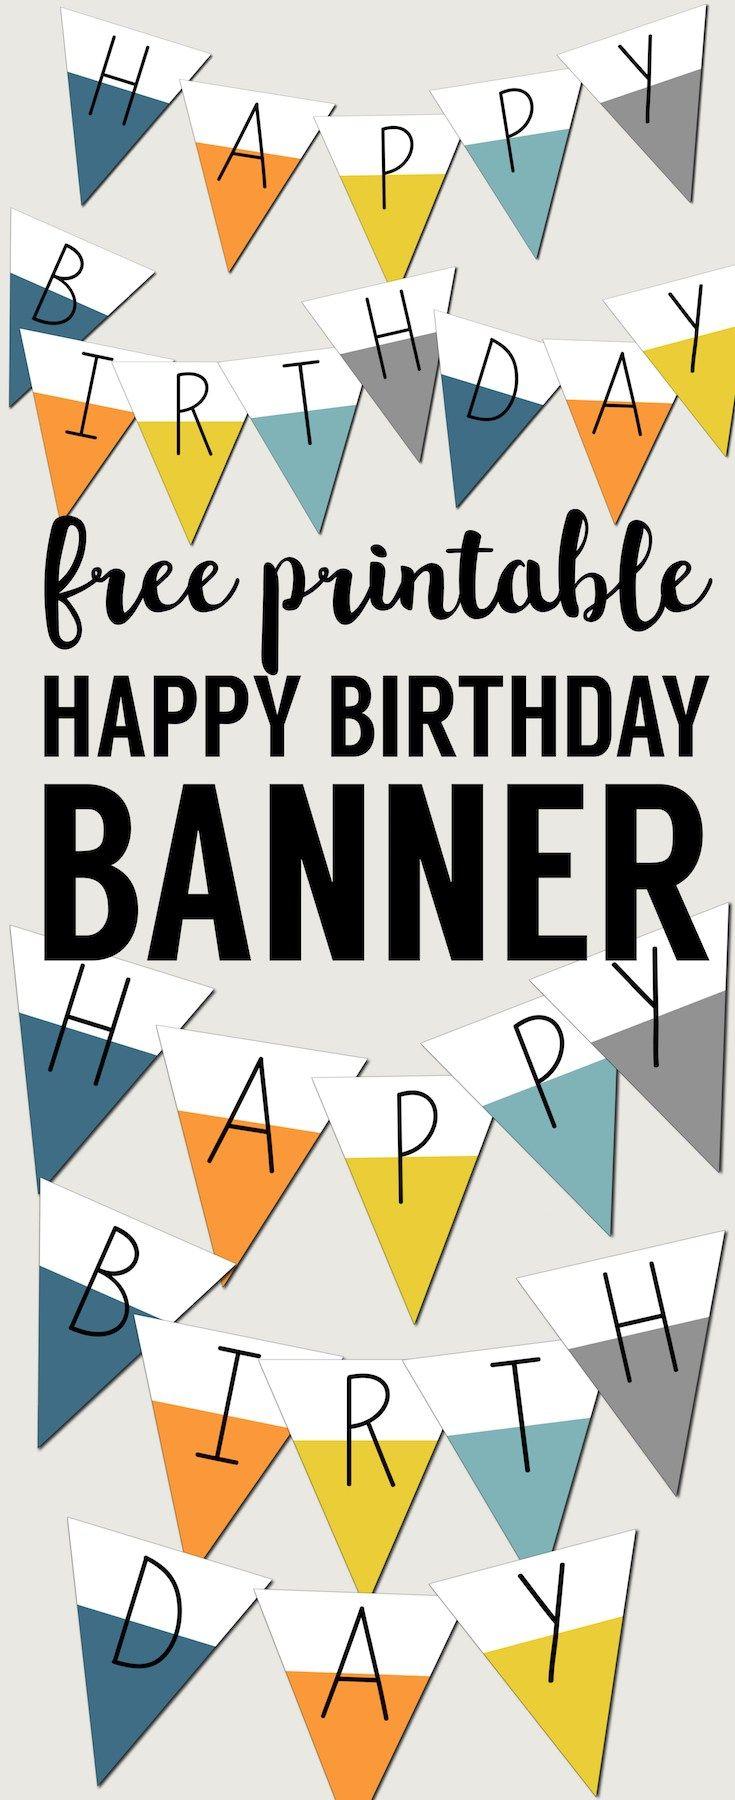 Free Printable Happy Birthday Banner | Preschool | Birthday, Happy - Free Printable Happy Birthday Signs